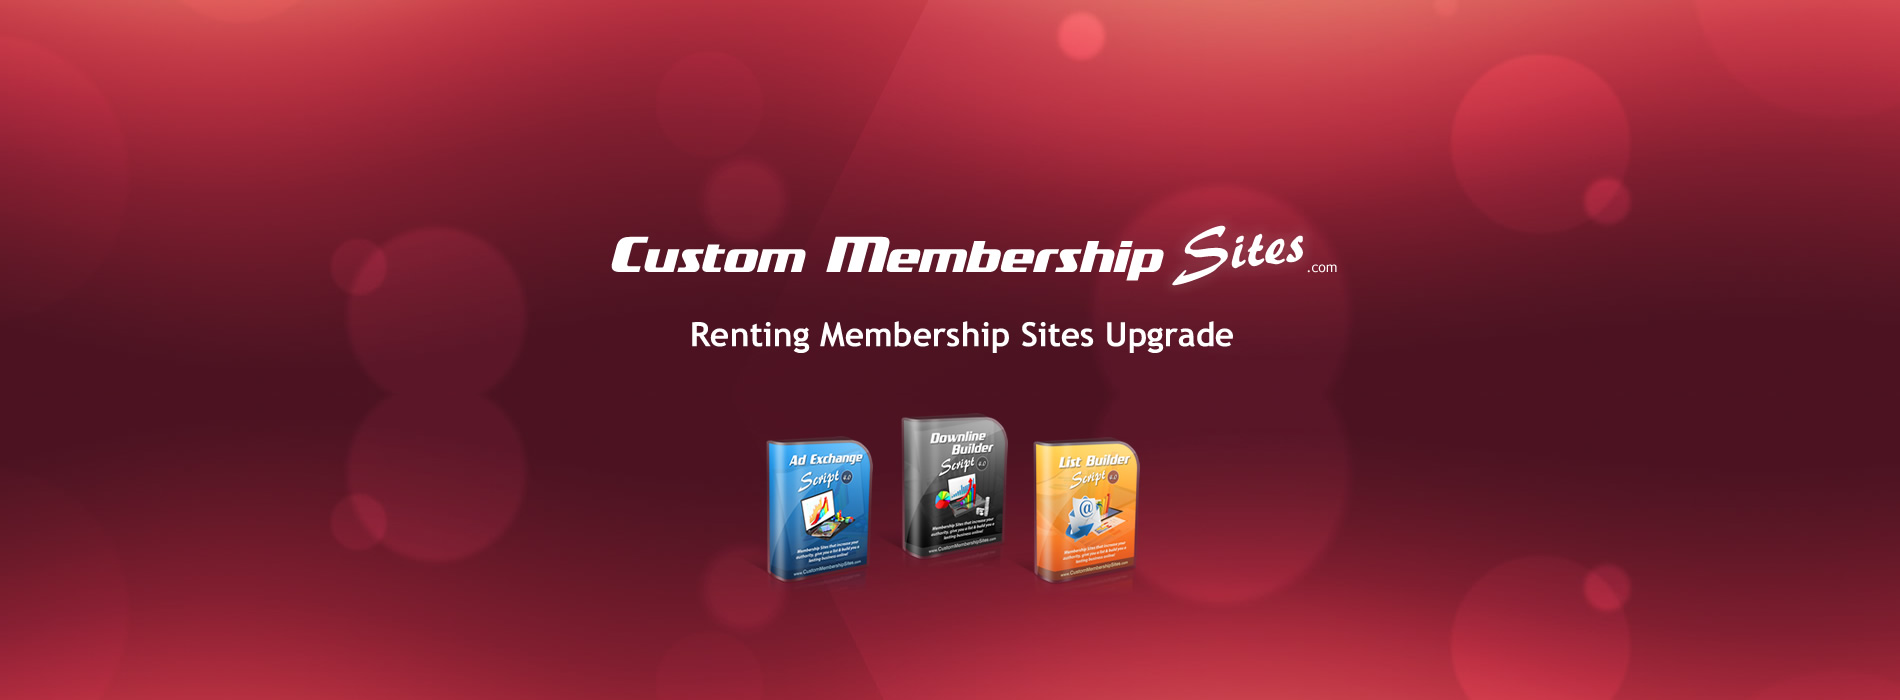 Renting Membership Sites Upgrade